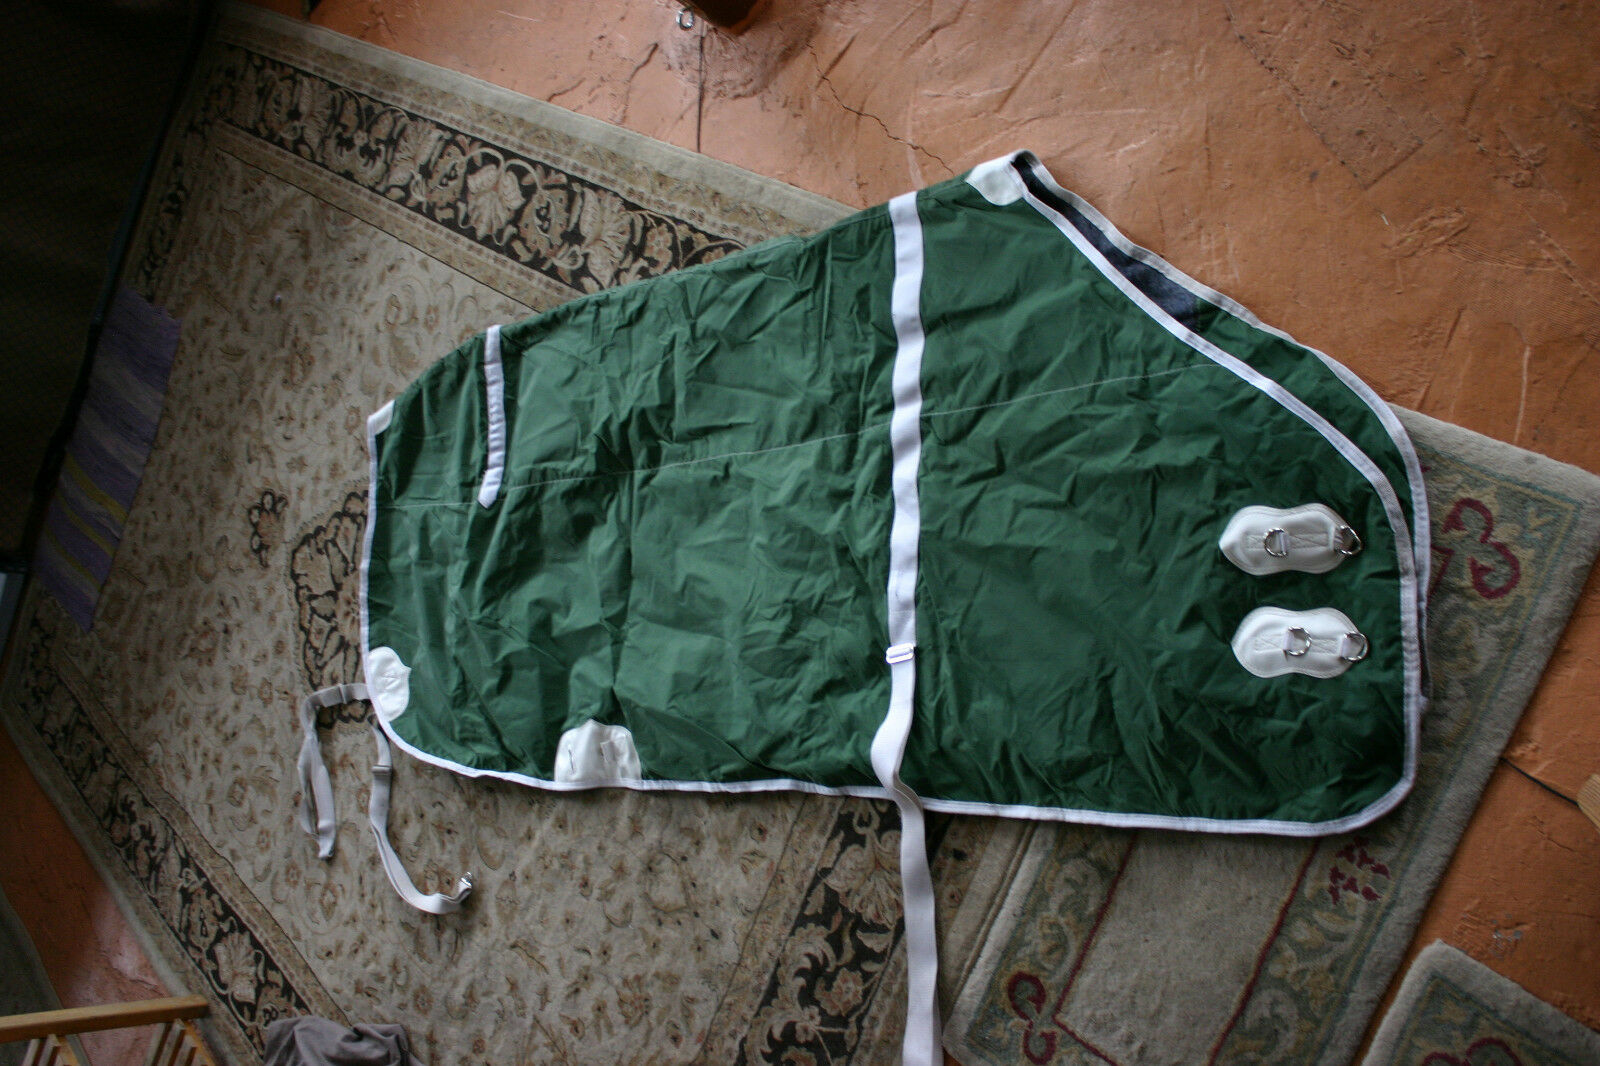 Draft Horse winter blanket  size 96 , adjusts to 94  Coblentz Collar brand  enjoy saving 30-50% off